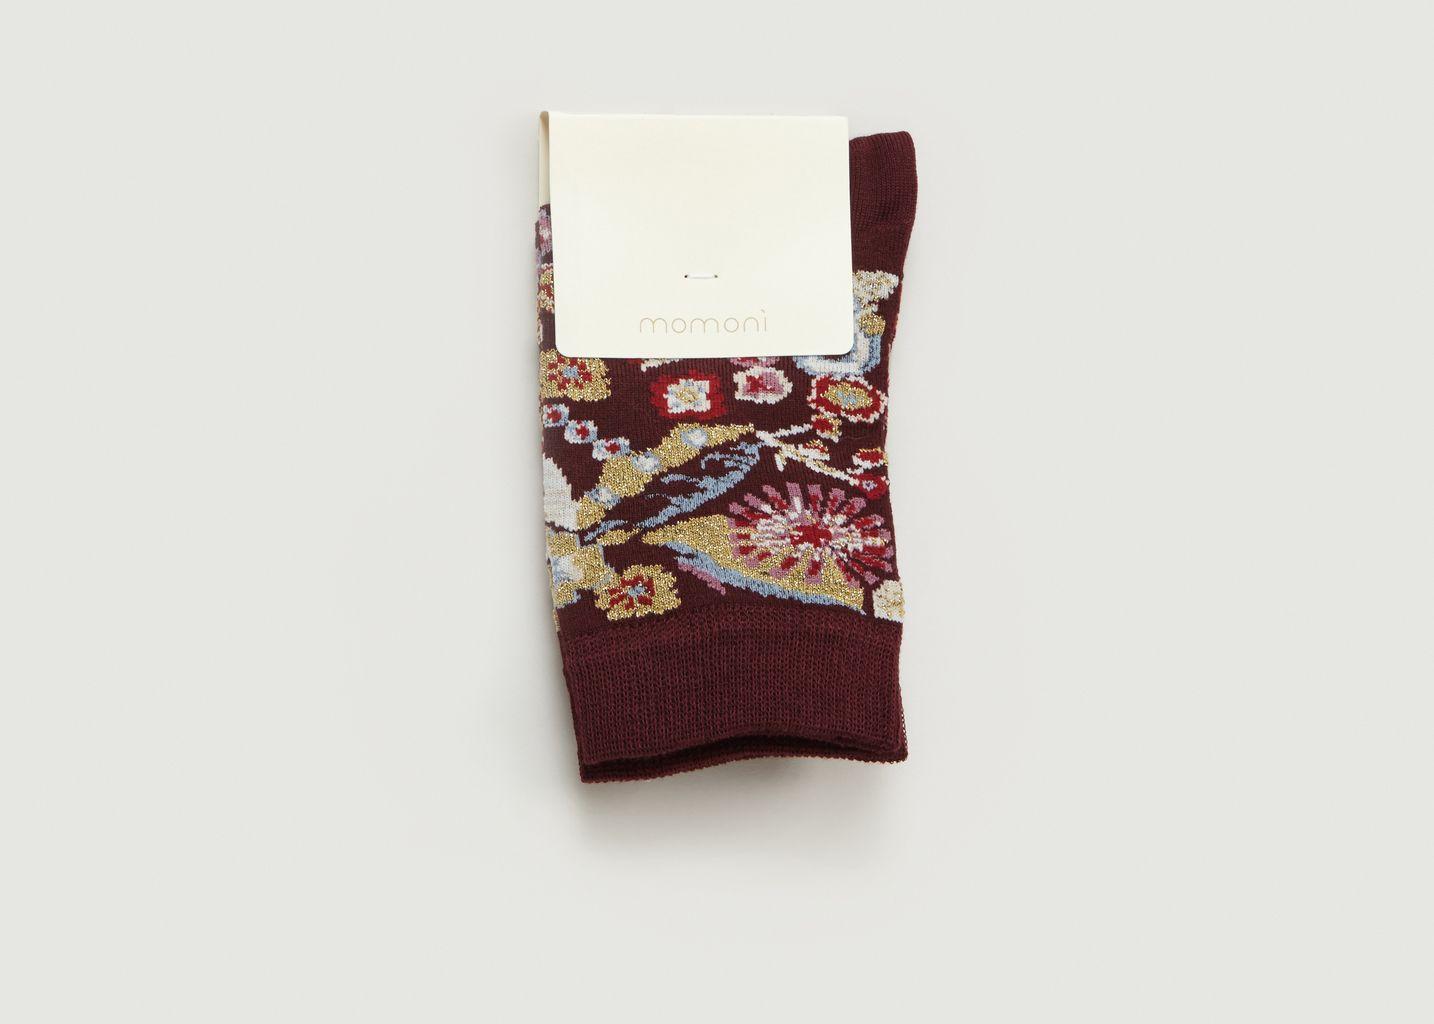 Chaussettes Vanille - Momoni